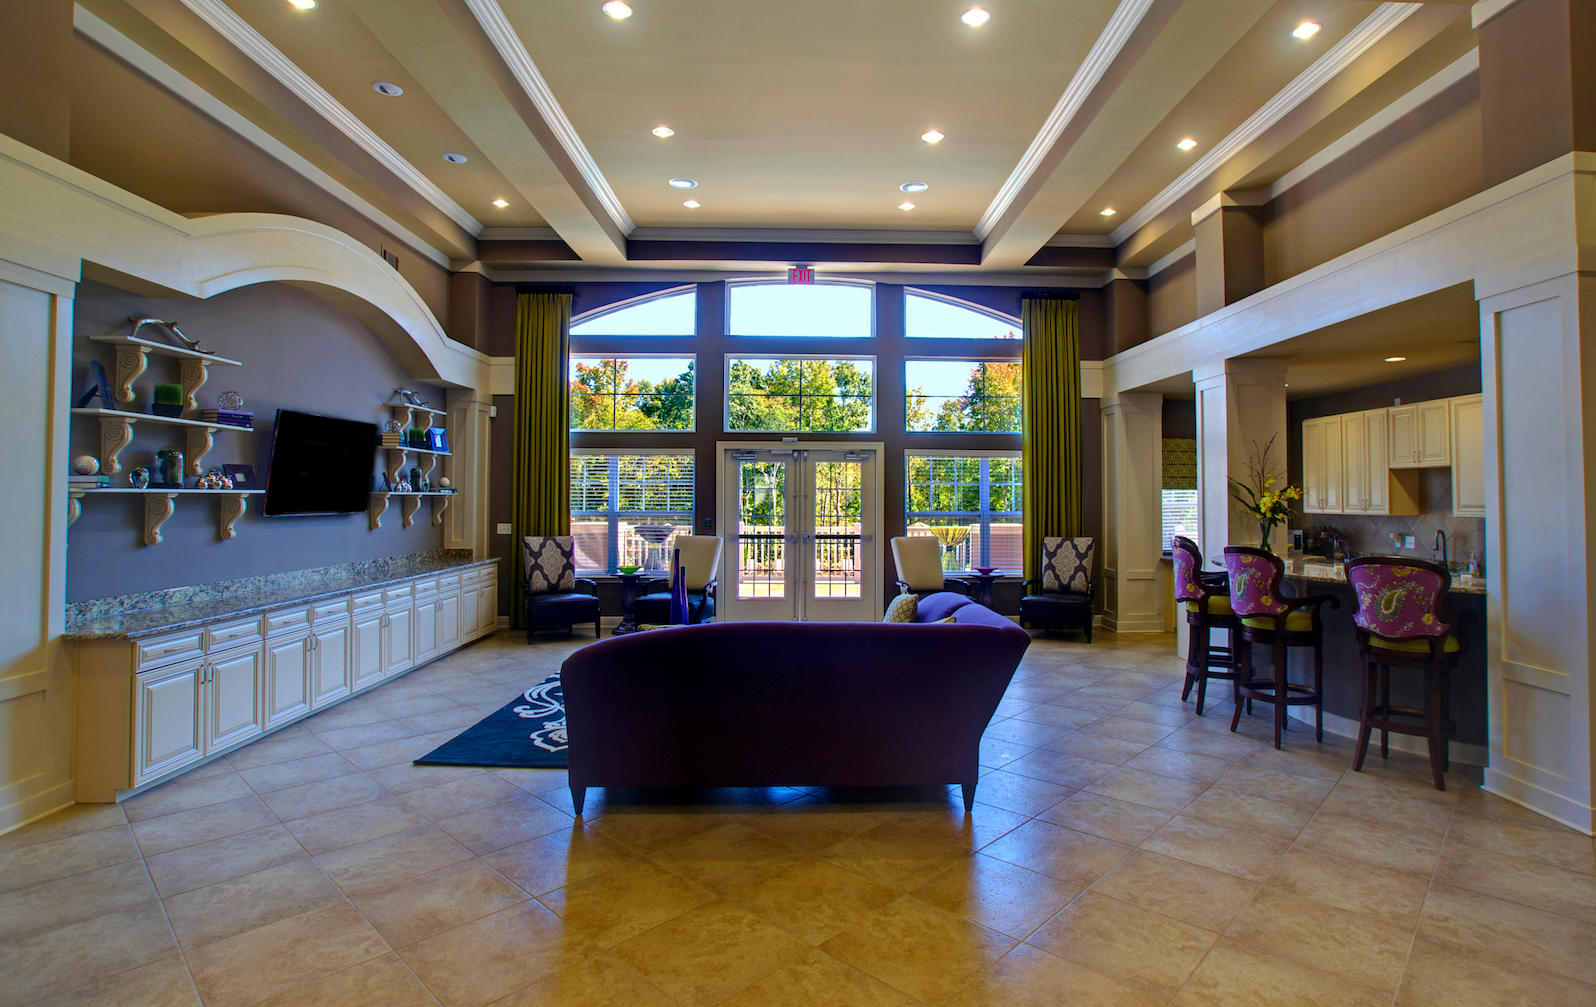 Phillips Mallard Creek Apartments image 3